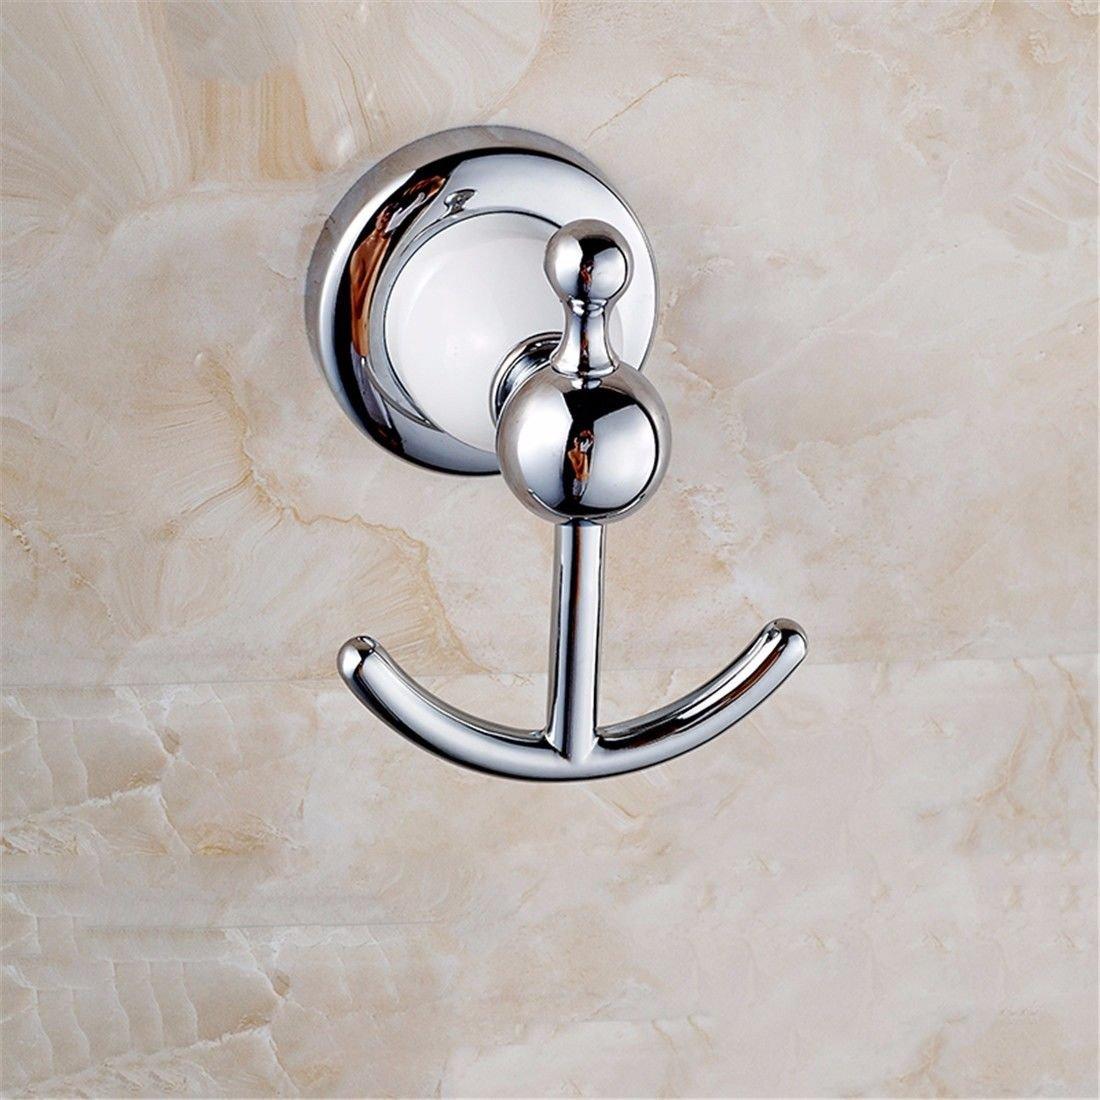 AiRobin-Continental Brass Baked White Paint Chrome Robe Hook Bathroom Accessory